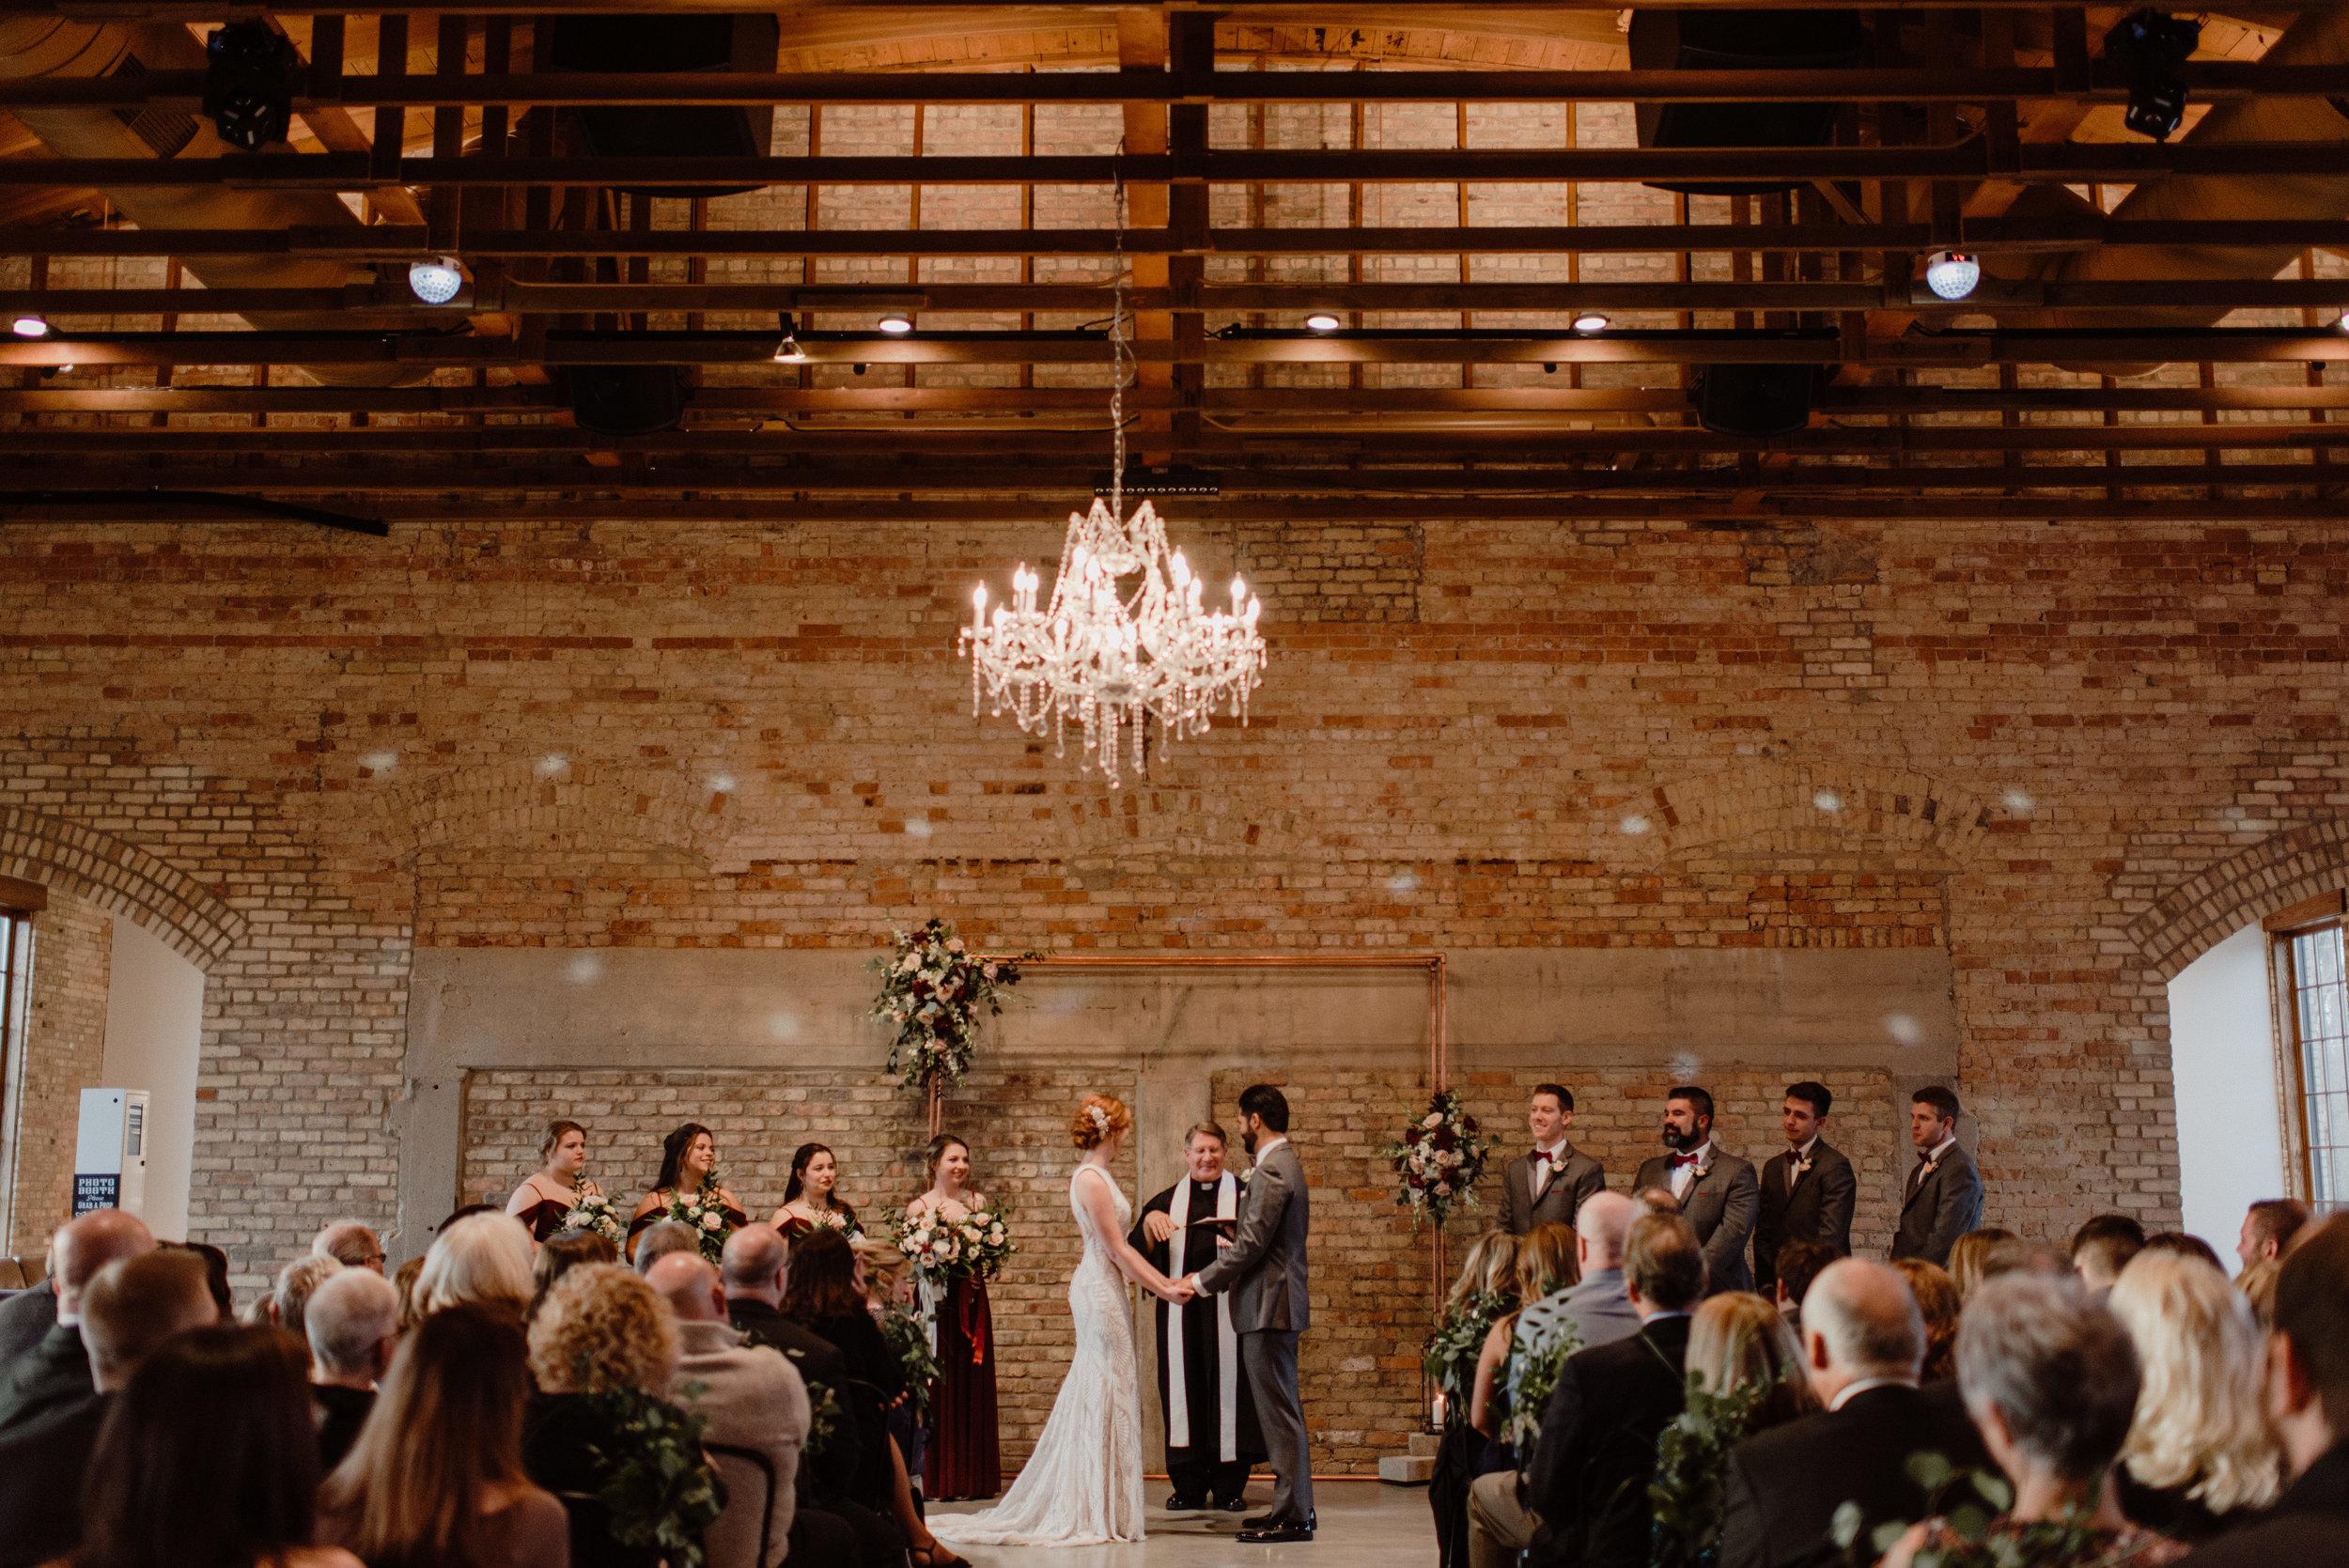 The Brix on Fox, Chicago Wedding Photographer, Zach and Rosalie00004.jpg